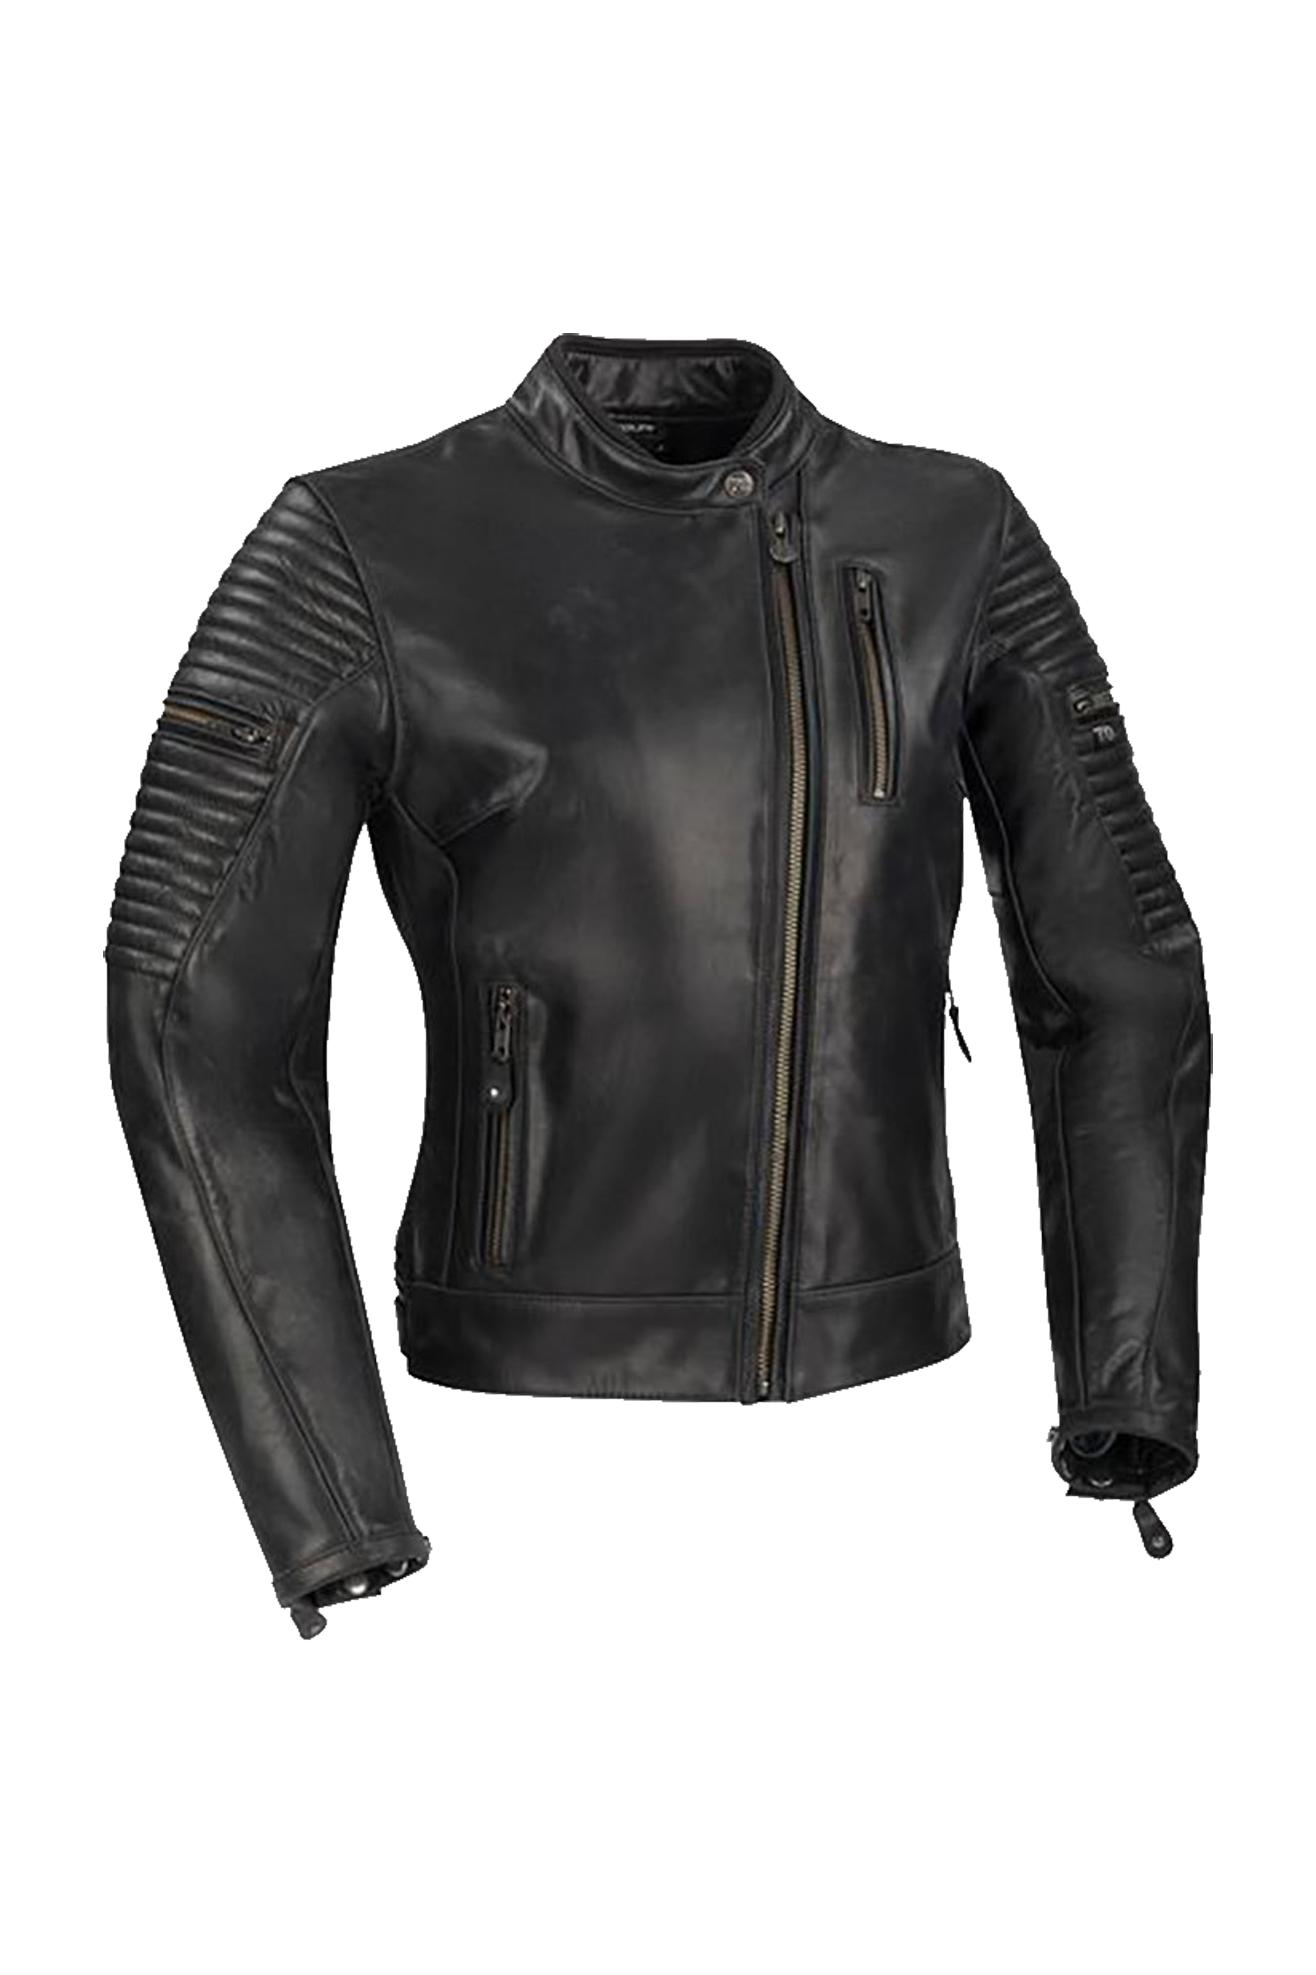 segura giacca moto donna  lady dolly nera